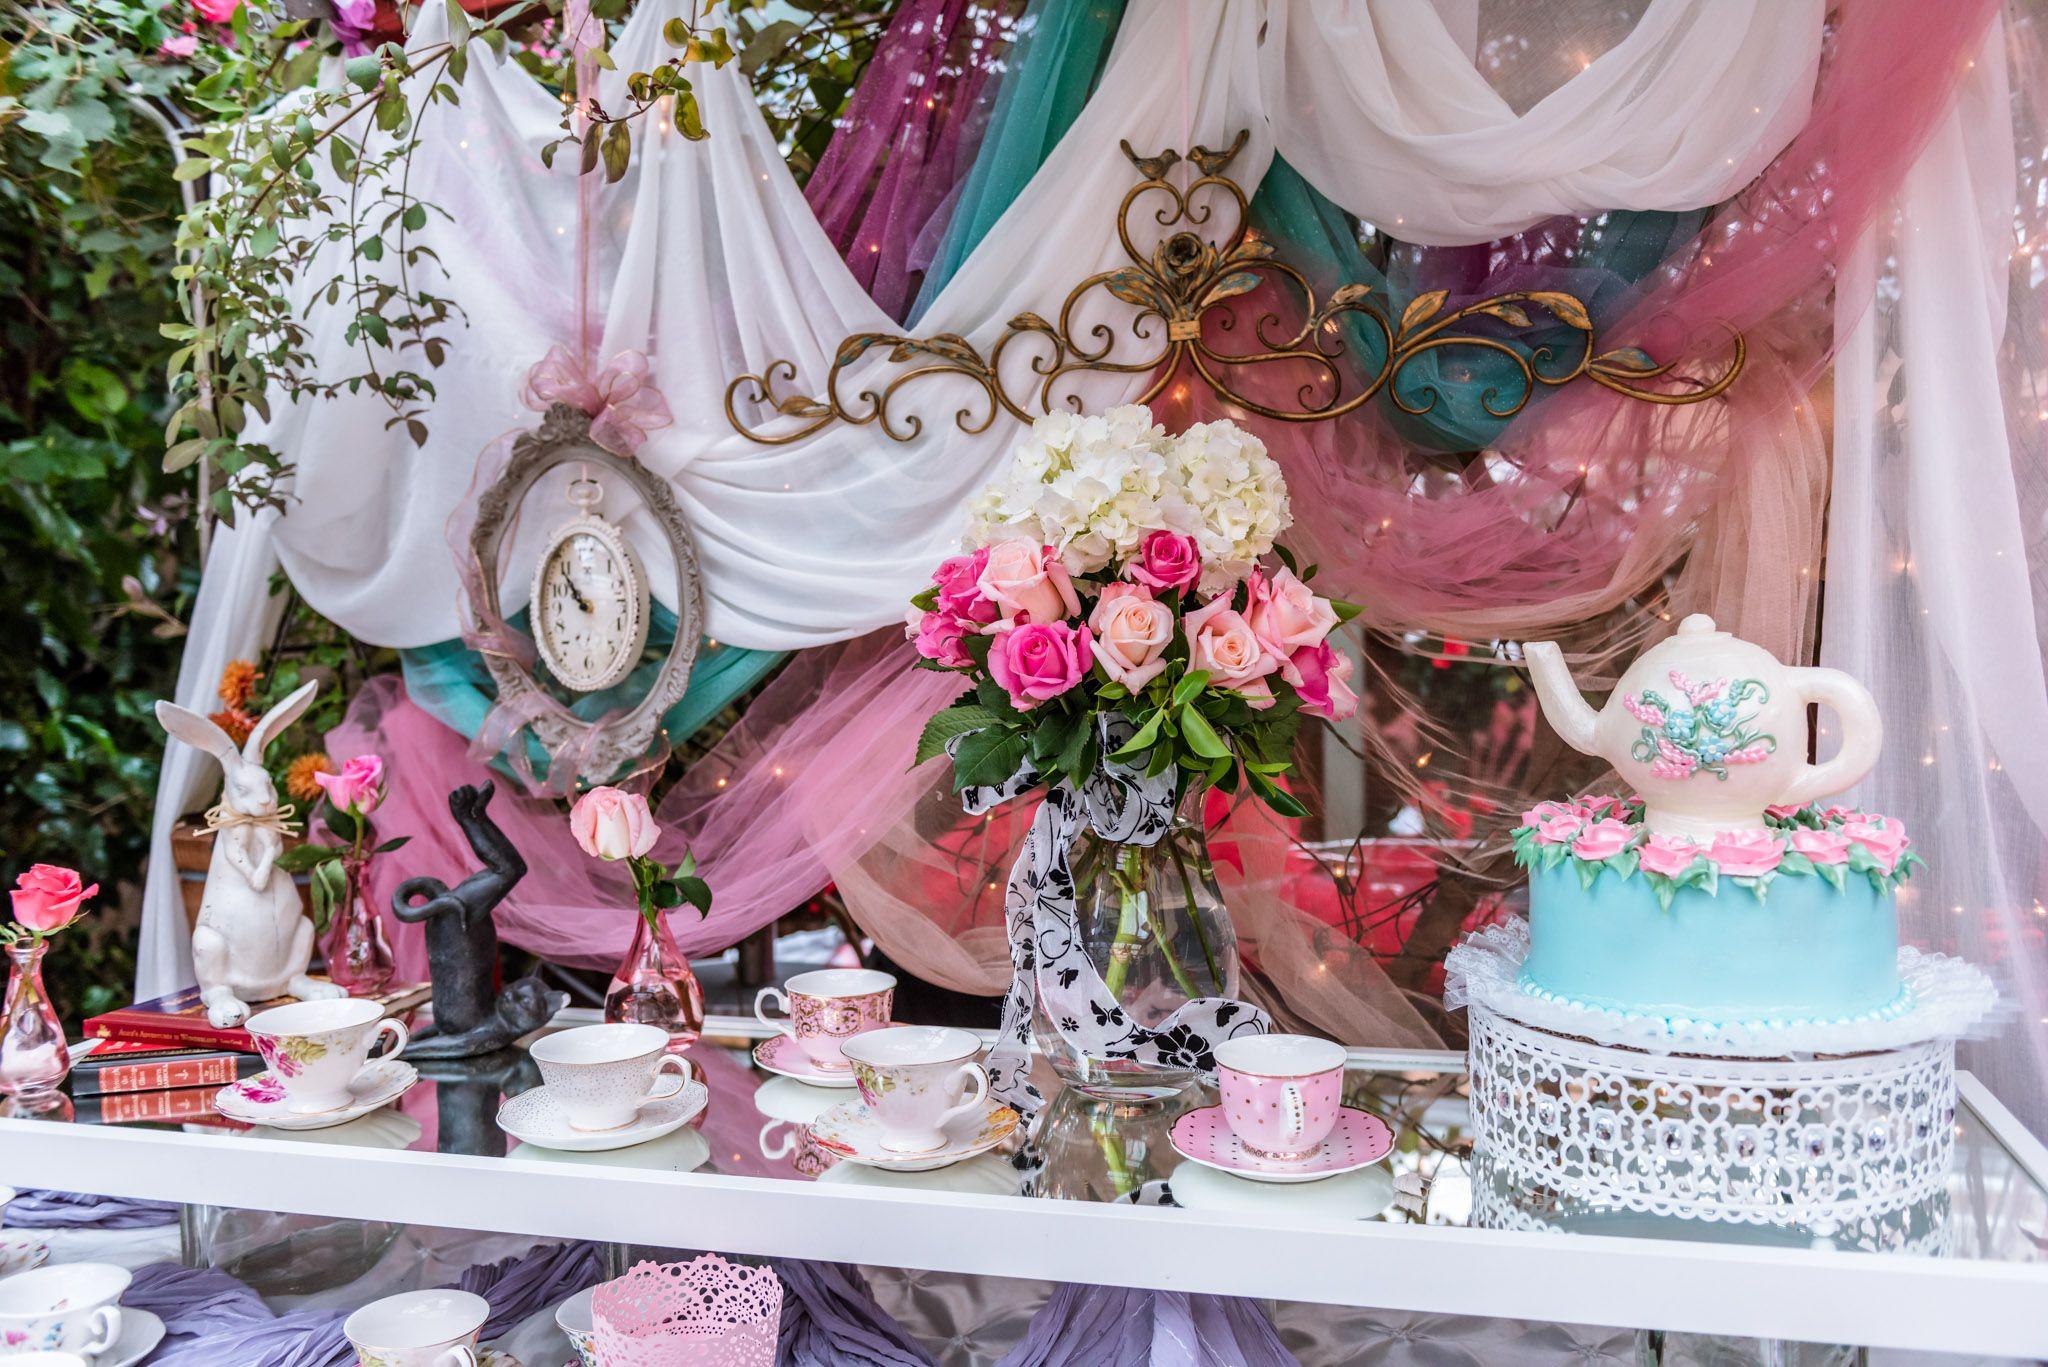 Sweet 16 Alice in Wonderland Party in Bexx Secret Garden ...